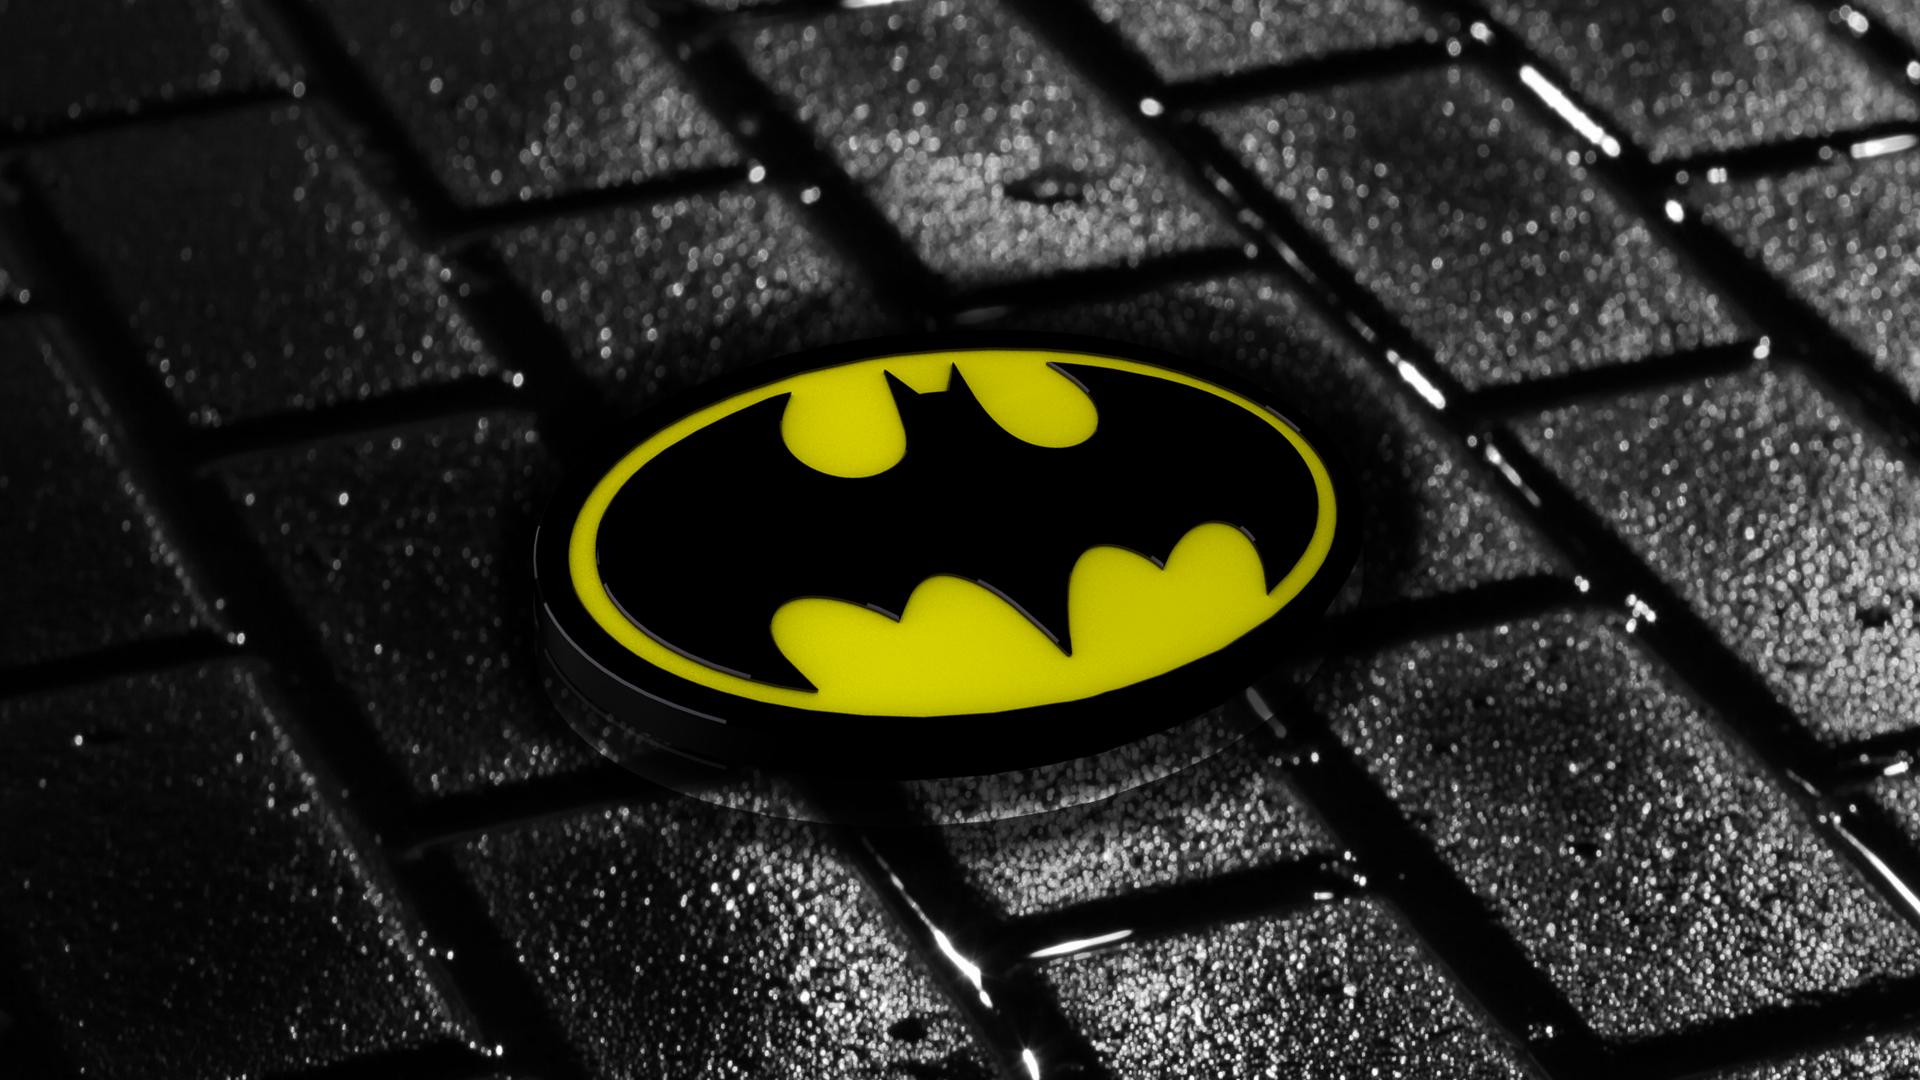 Batman 3D logo Wallpaper by RainbowZz